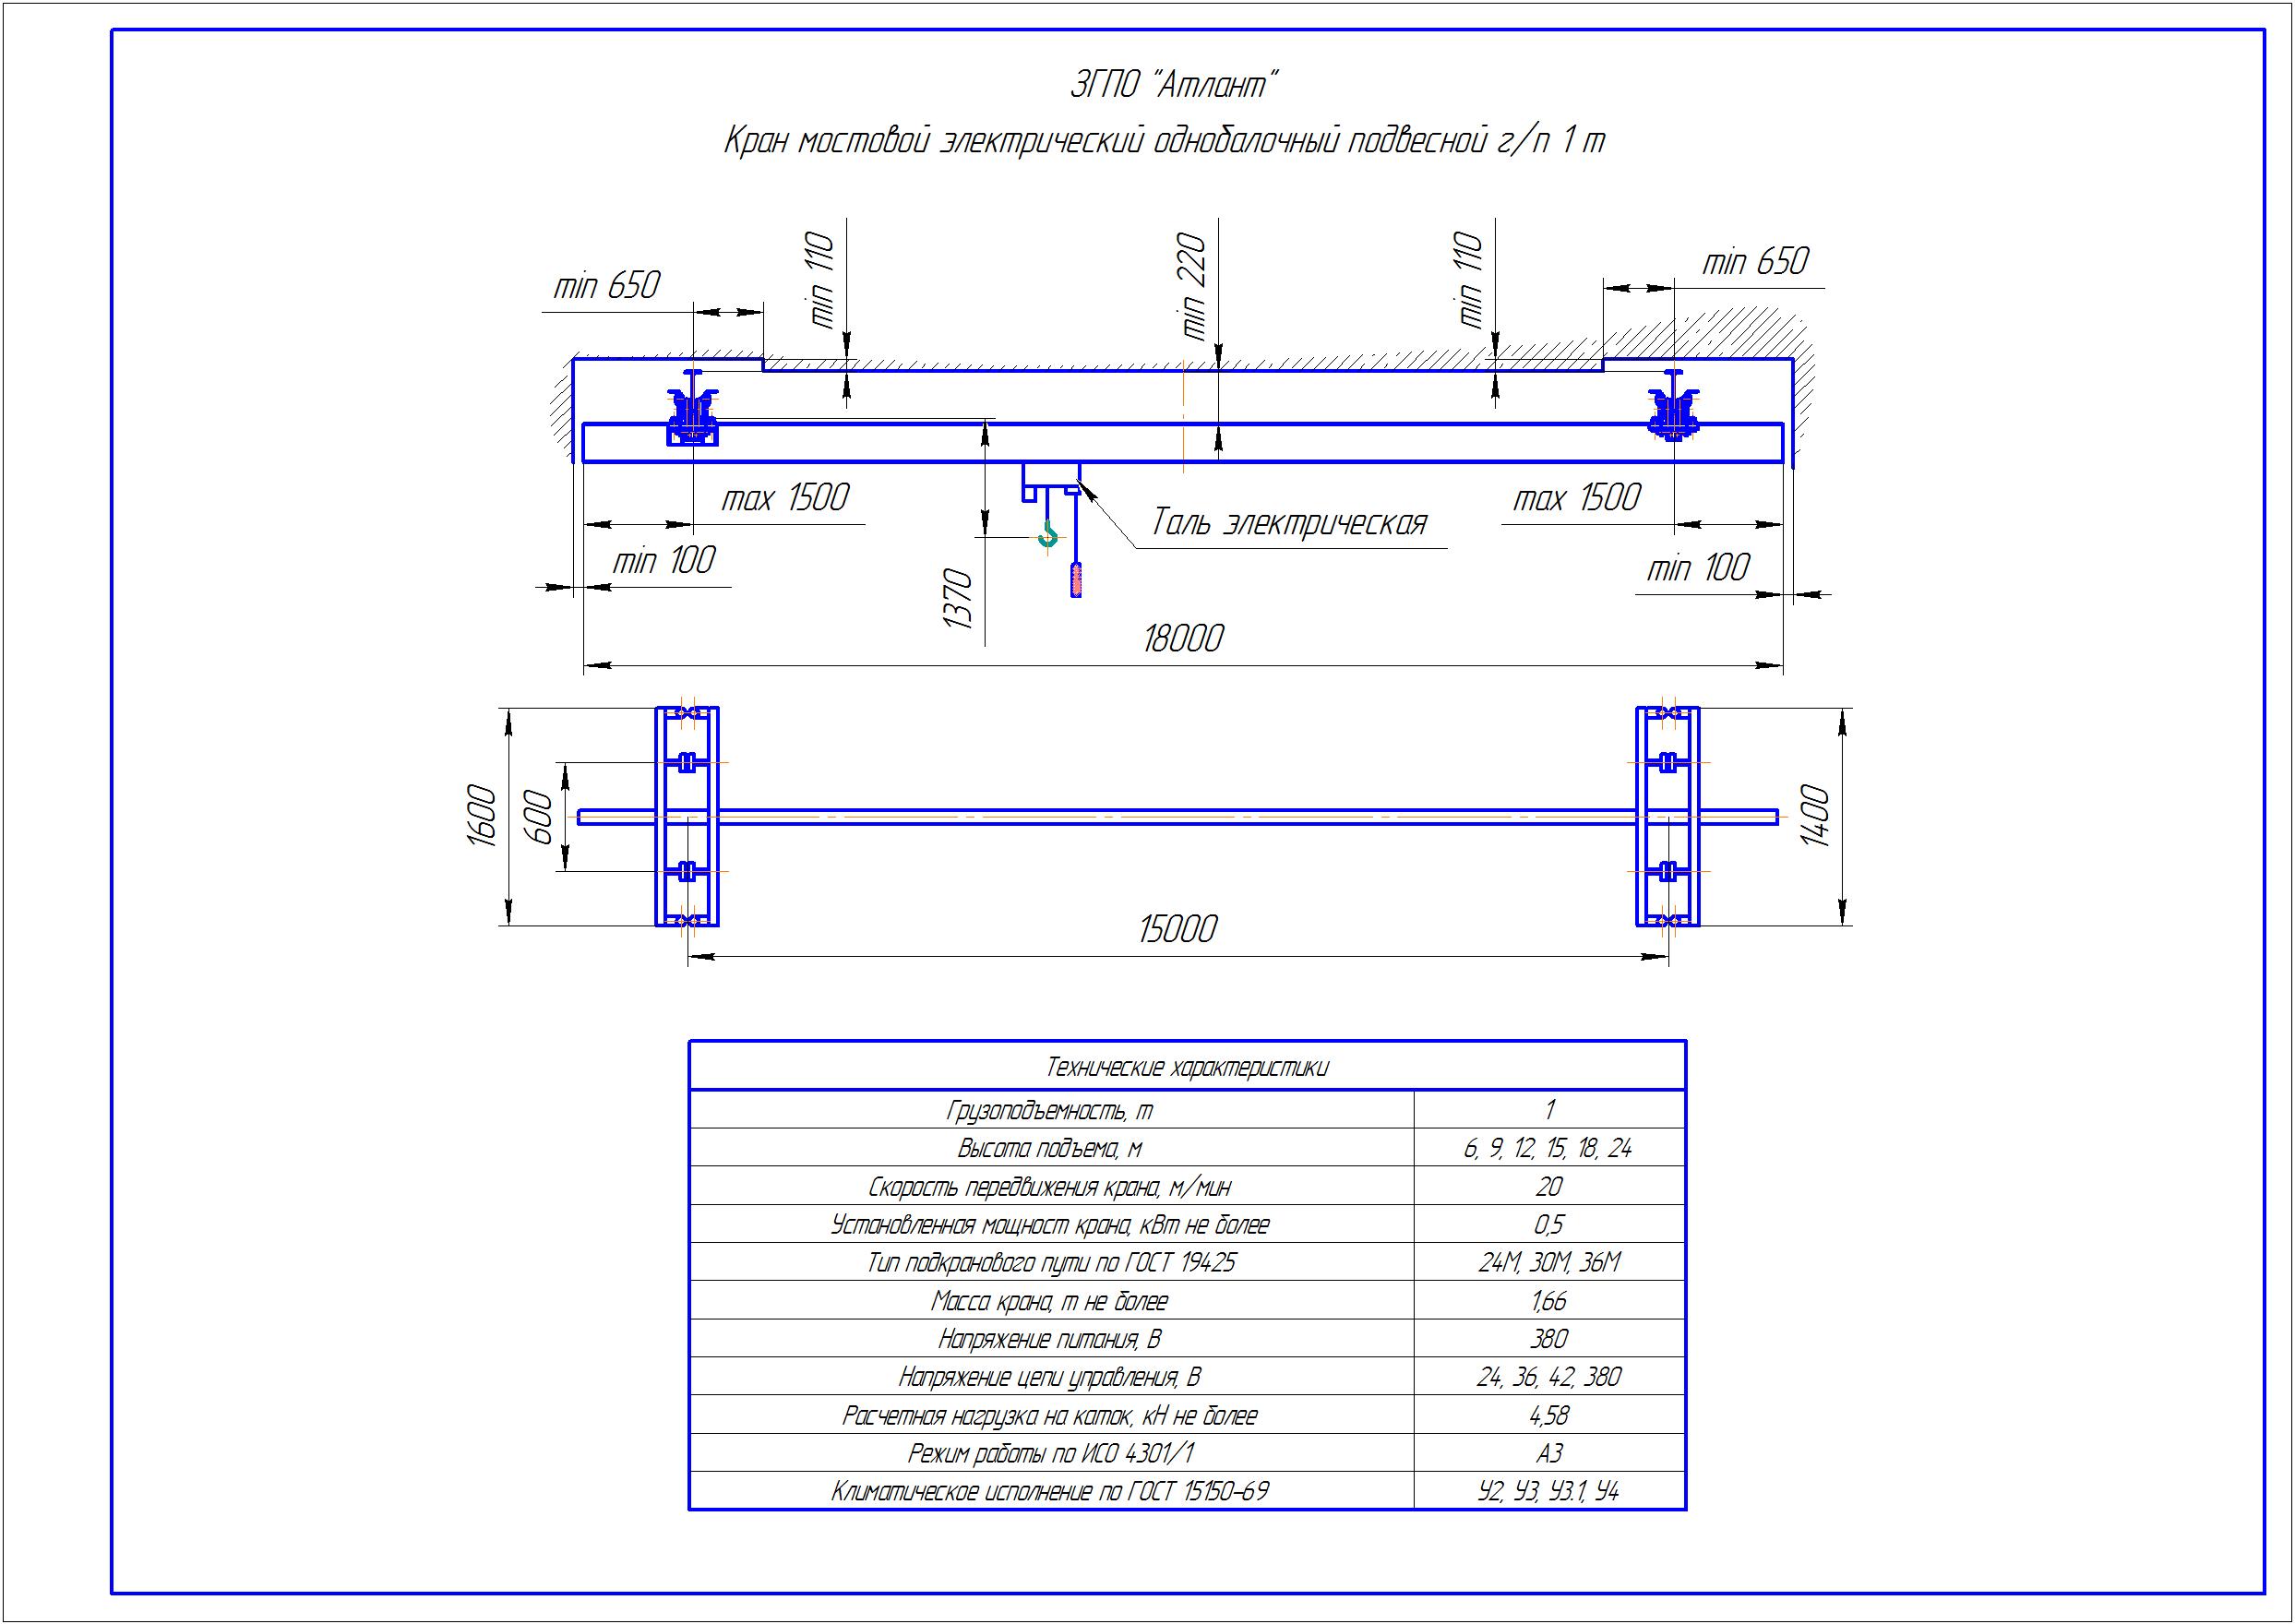 KBP 1 5 - Подвесная кран балка